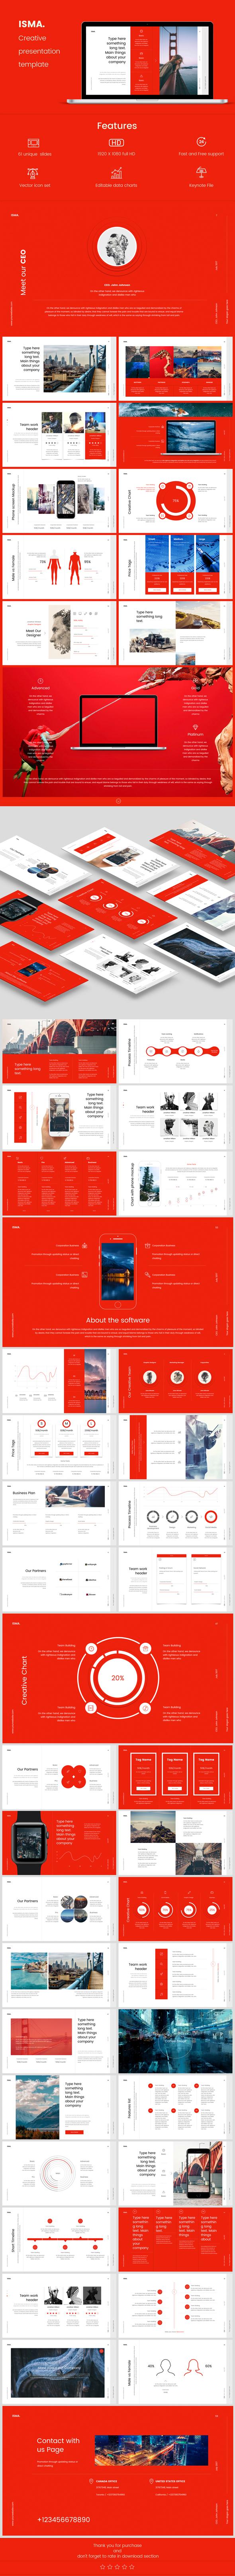 GraphicRiver Isma Keynote Presentation Template 20352513